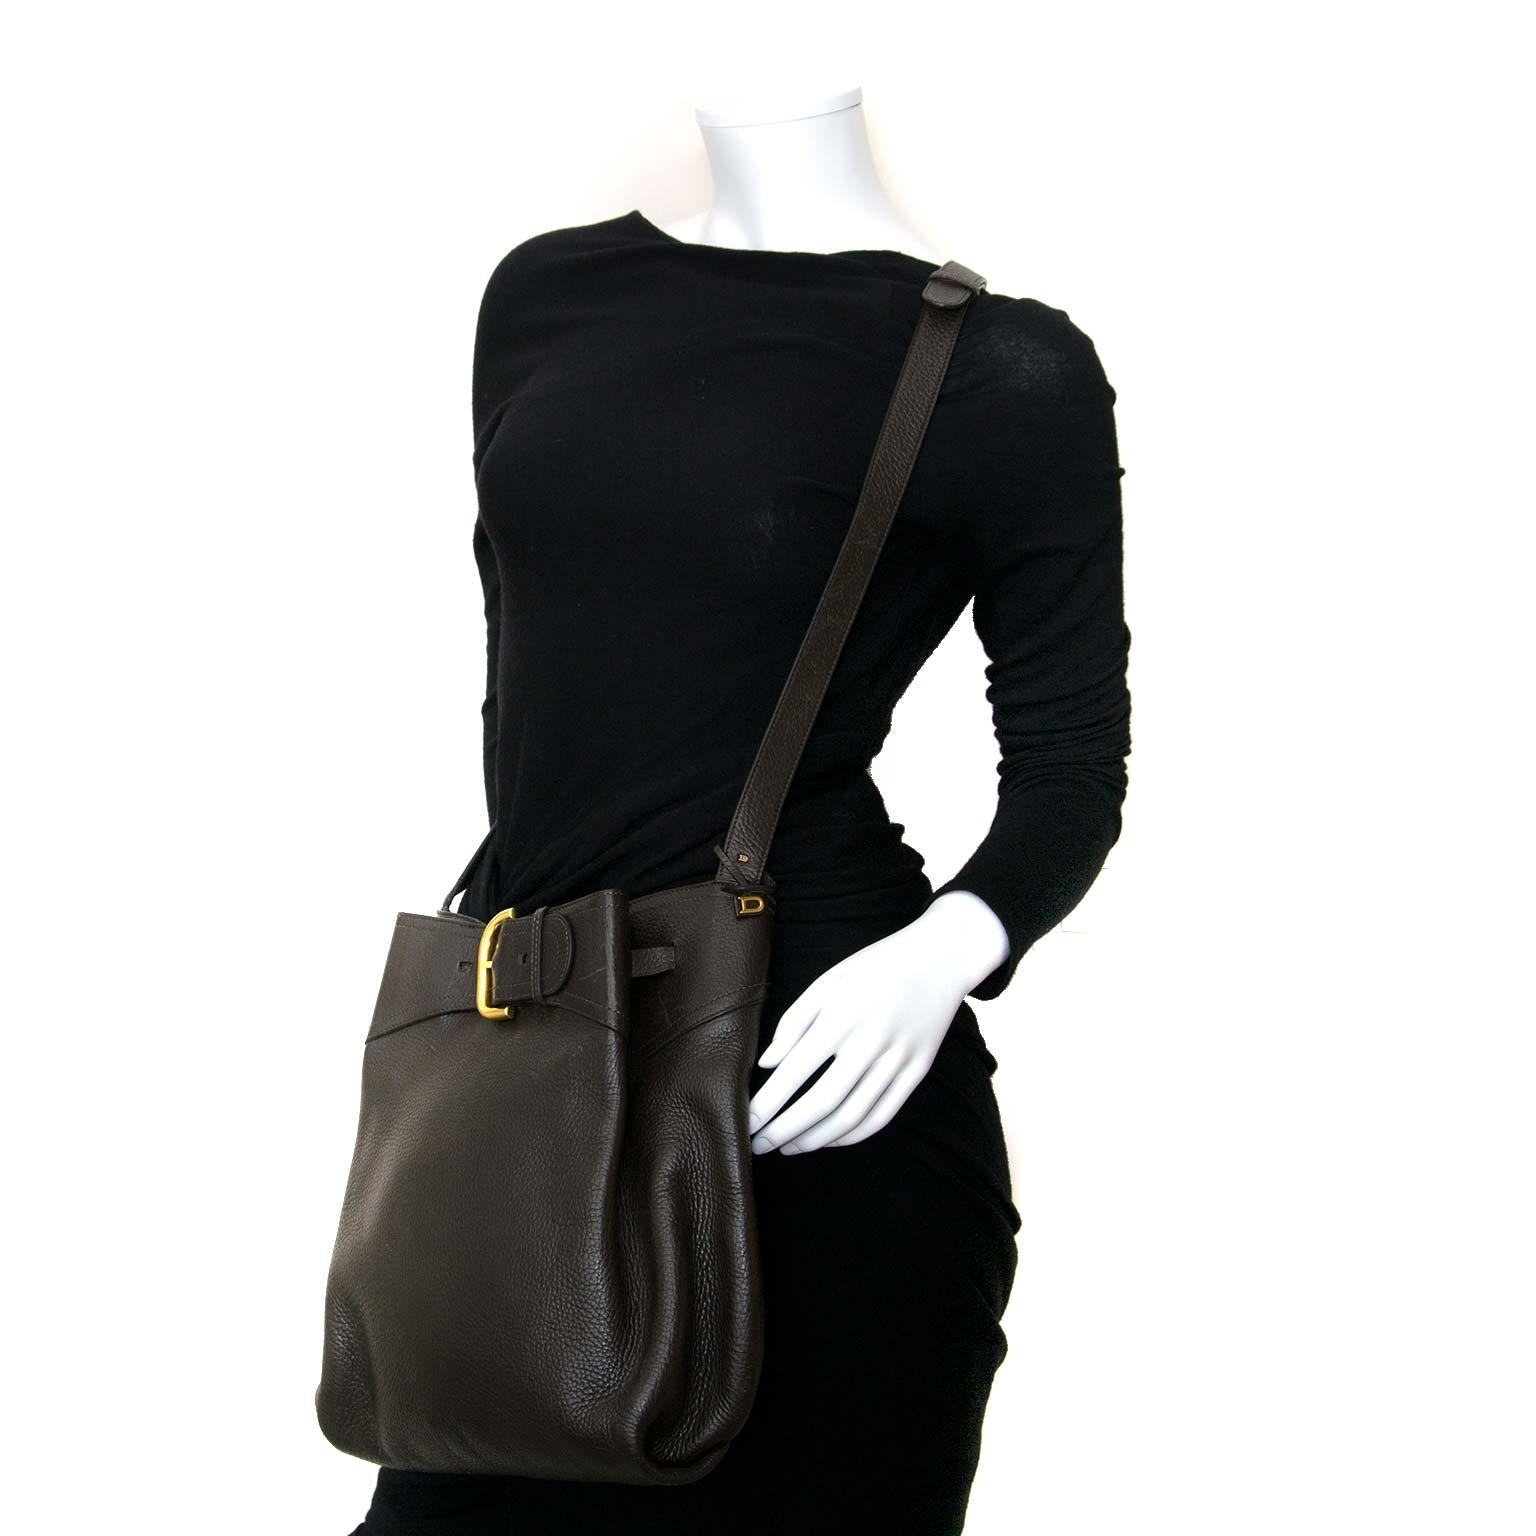 delvaux brown leather shoulder bag now for sale at labellov vintage fashion webshop belgium